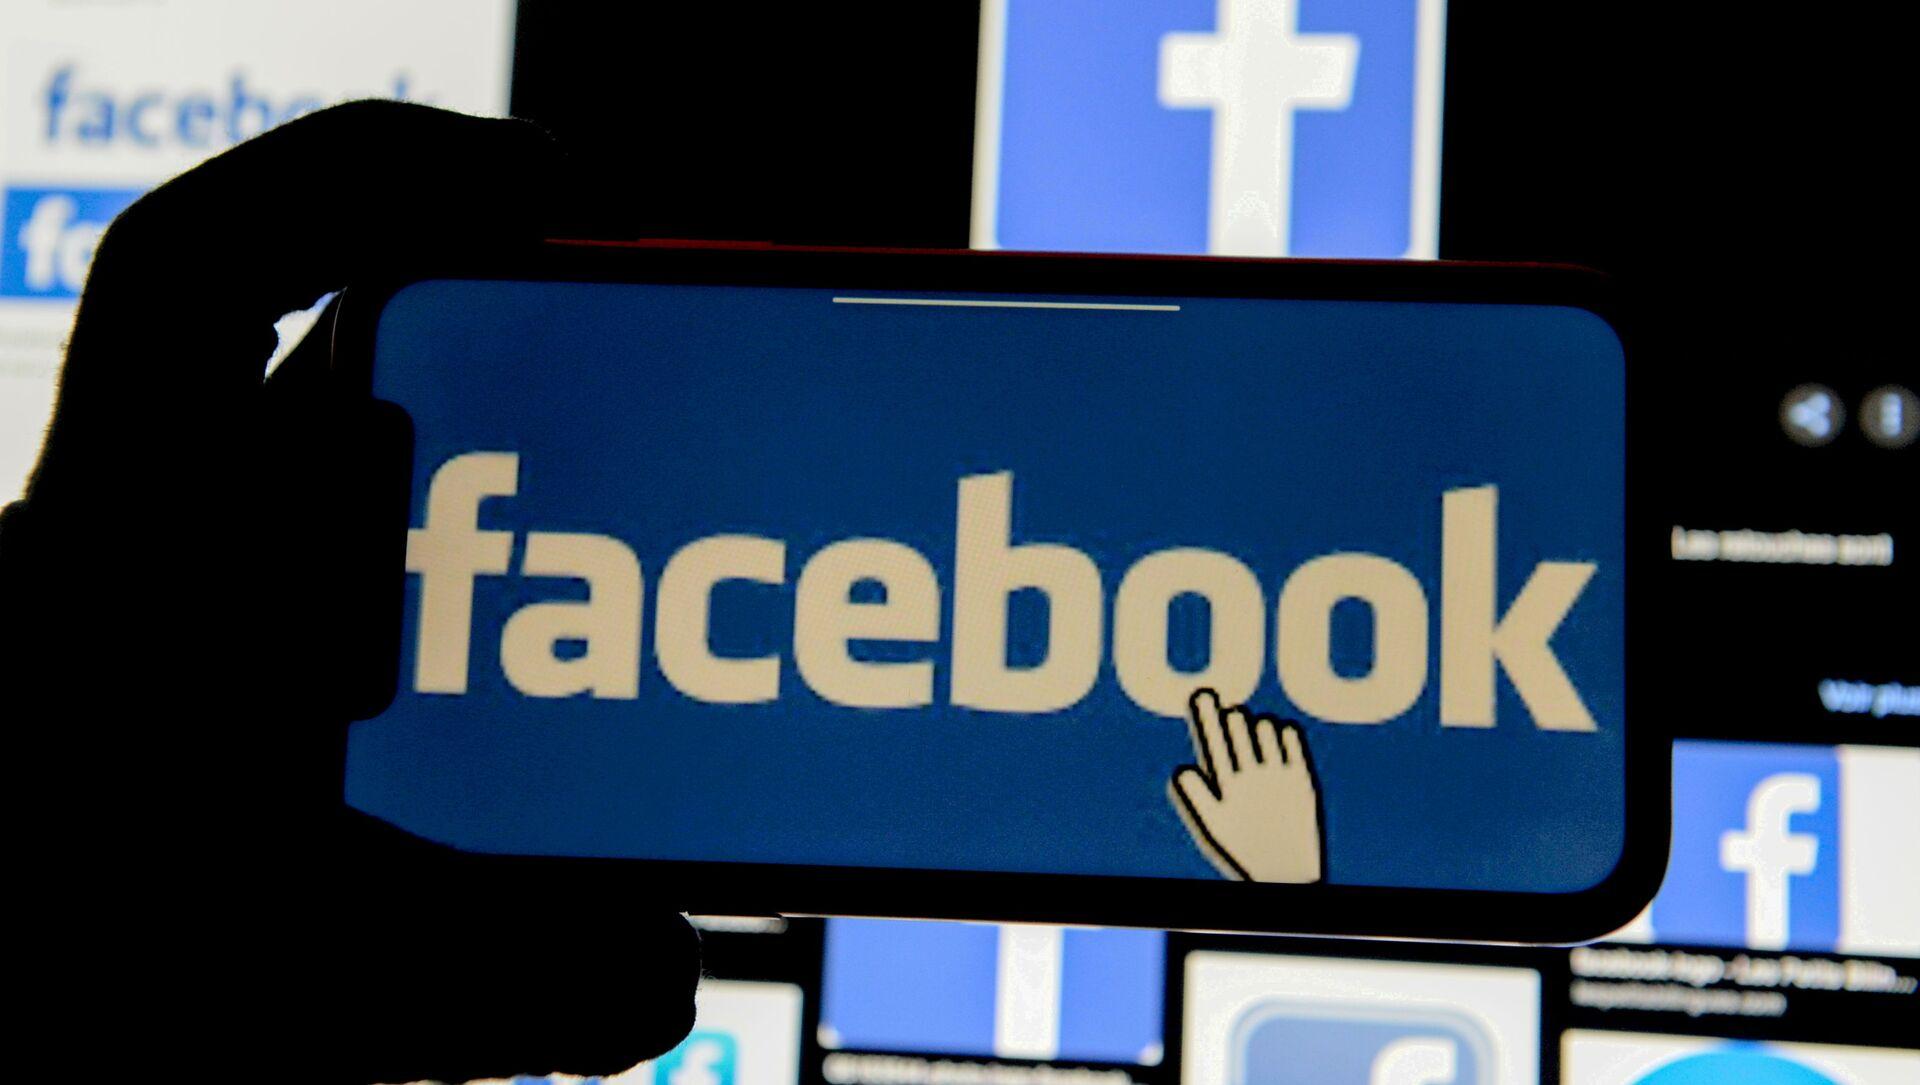 The Facebook logo is displayed on a mobile phone in this picture illustration taken 2 December 2019. - Sputnik International, 1920, 04.09.2021